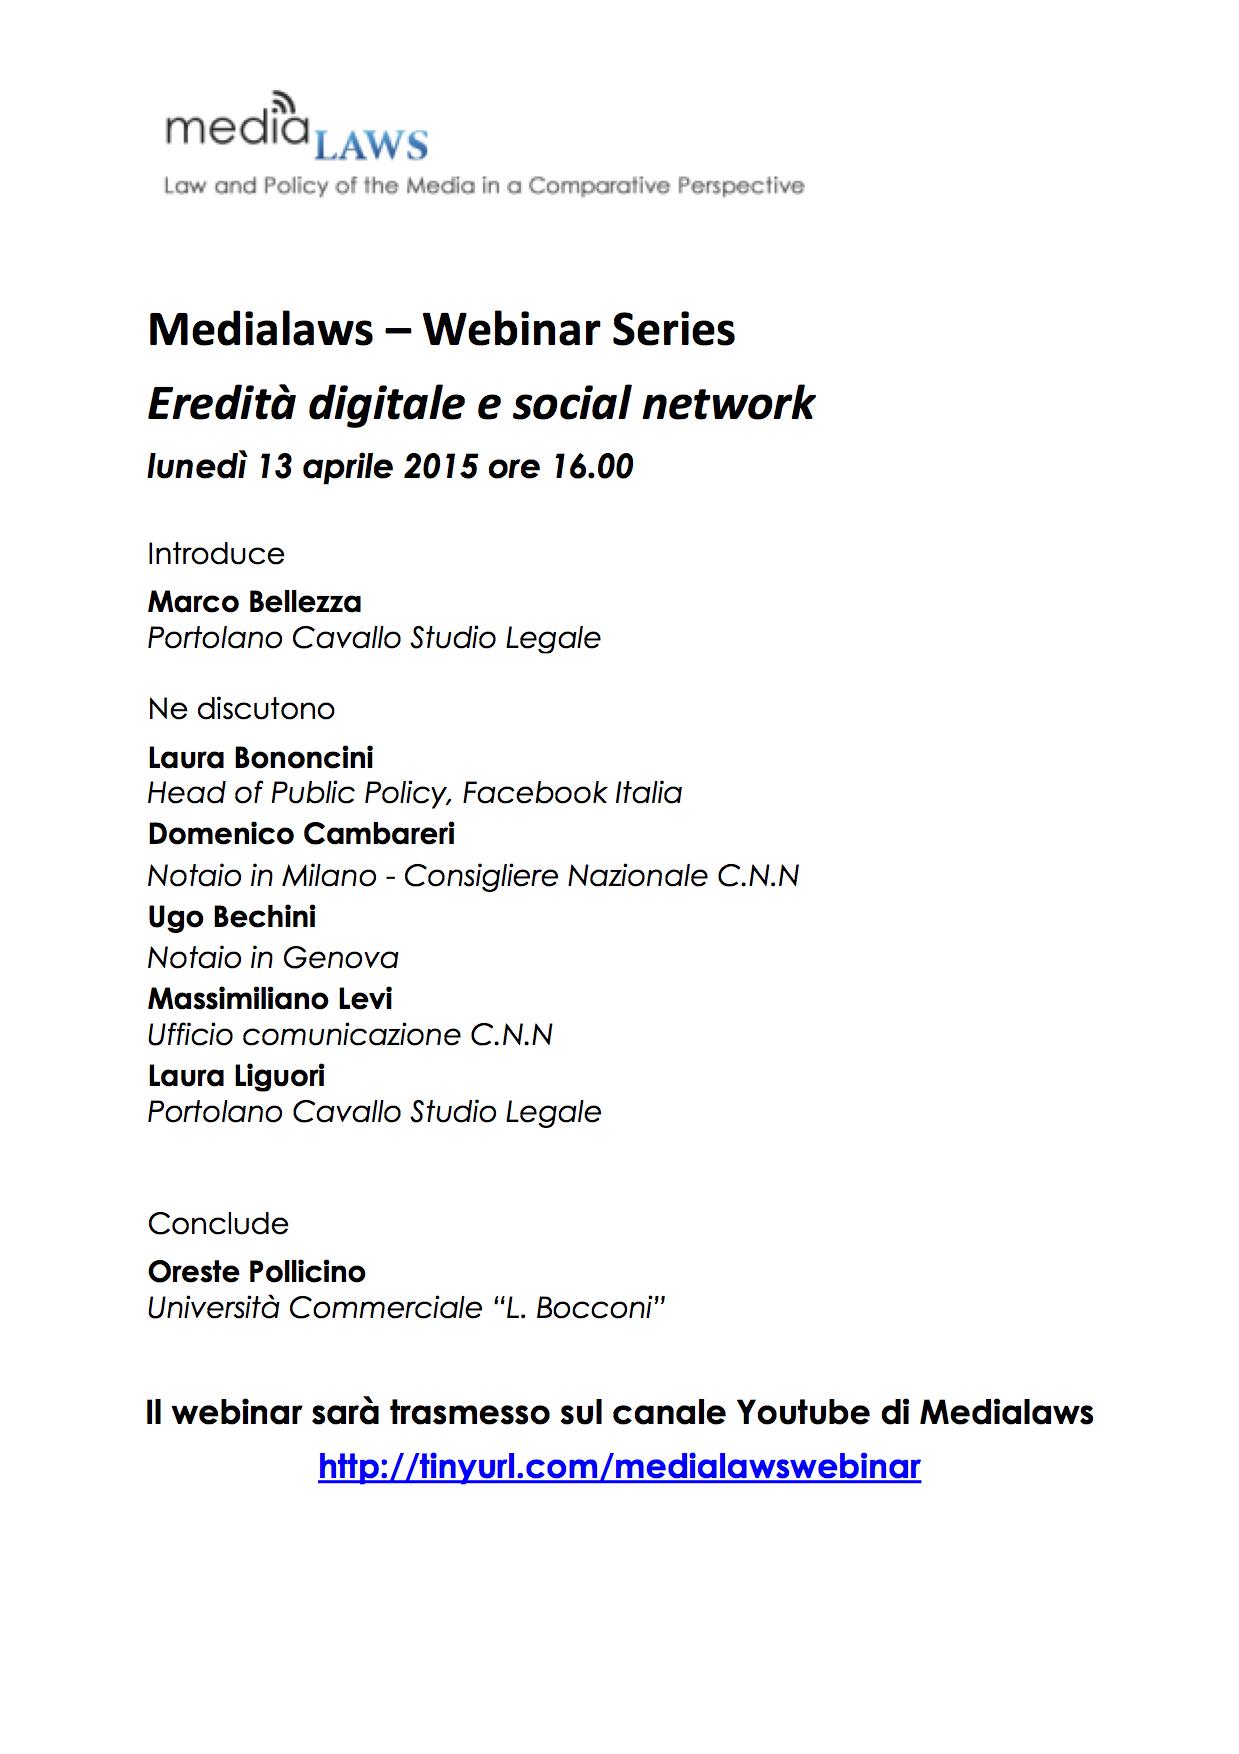 Locandina 13 aprile Medialaws